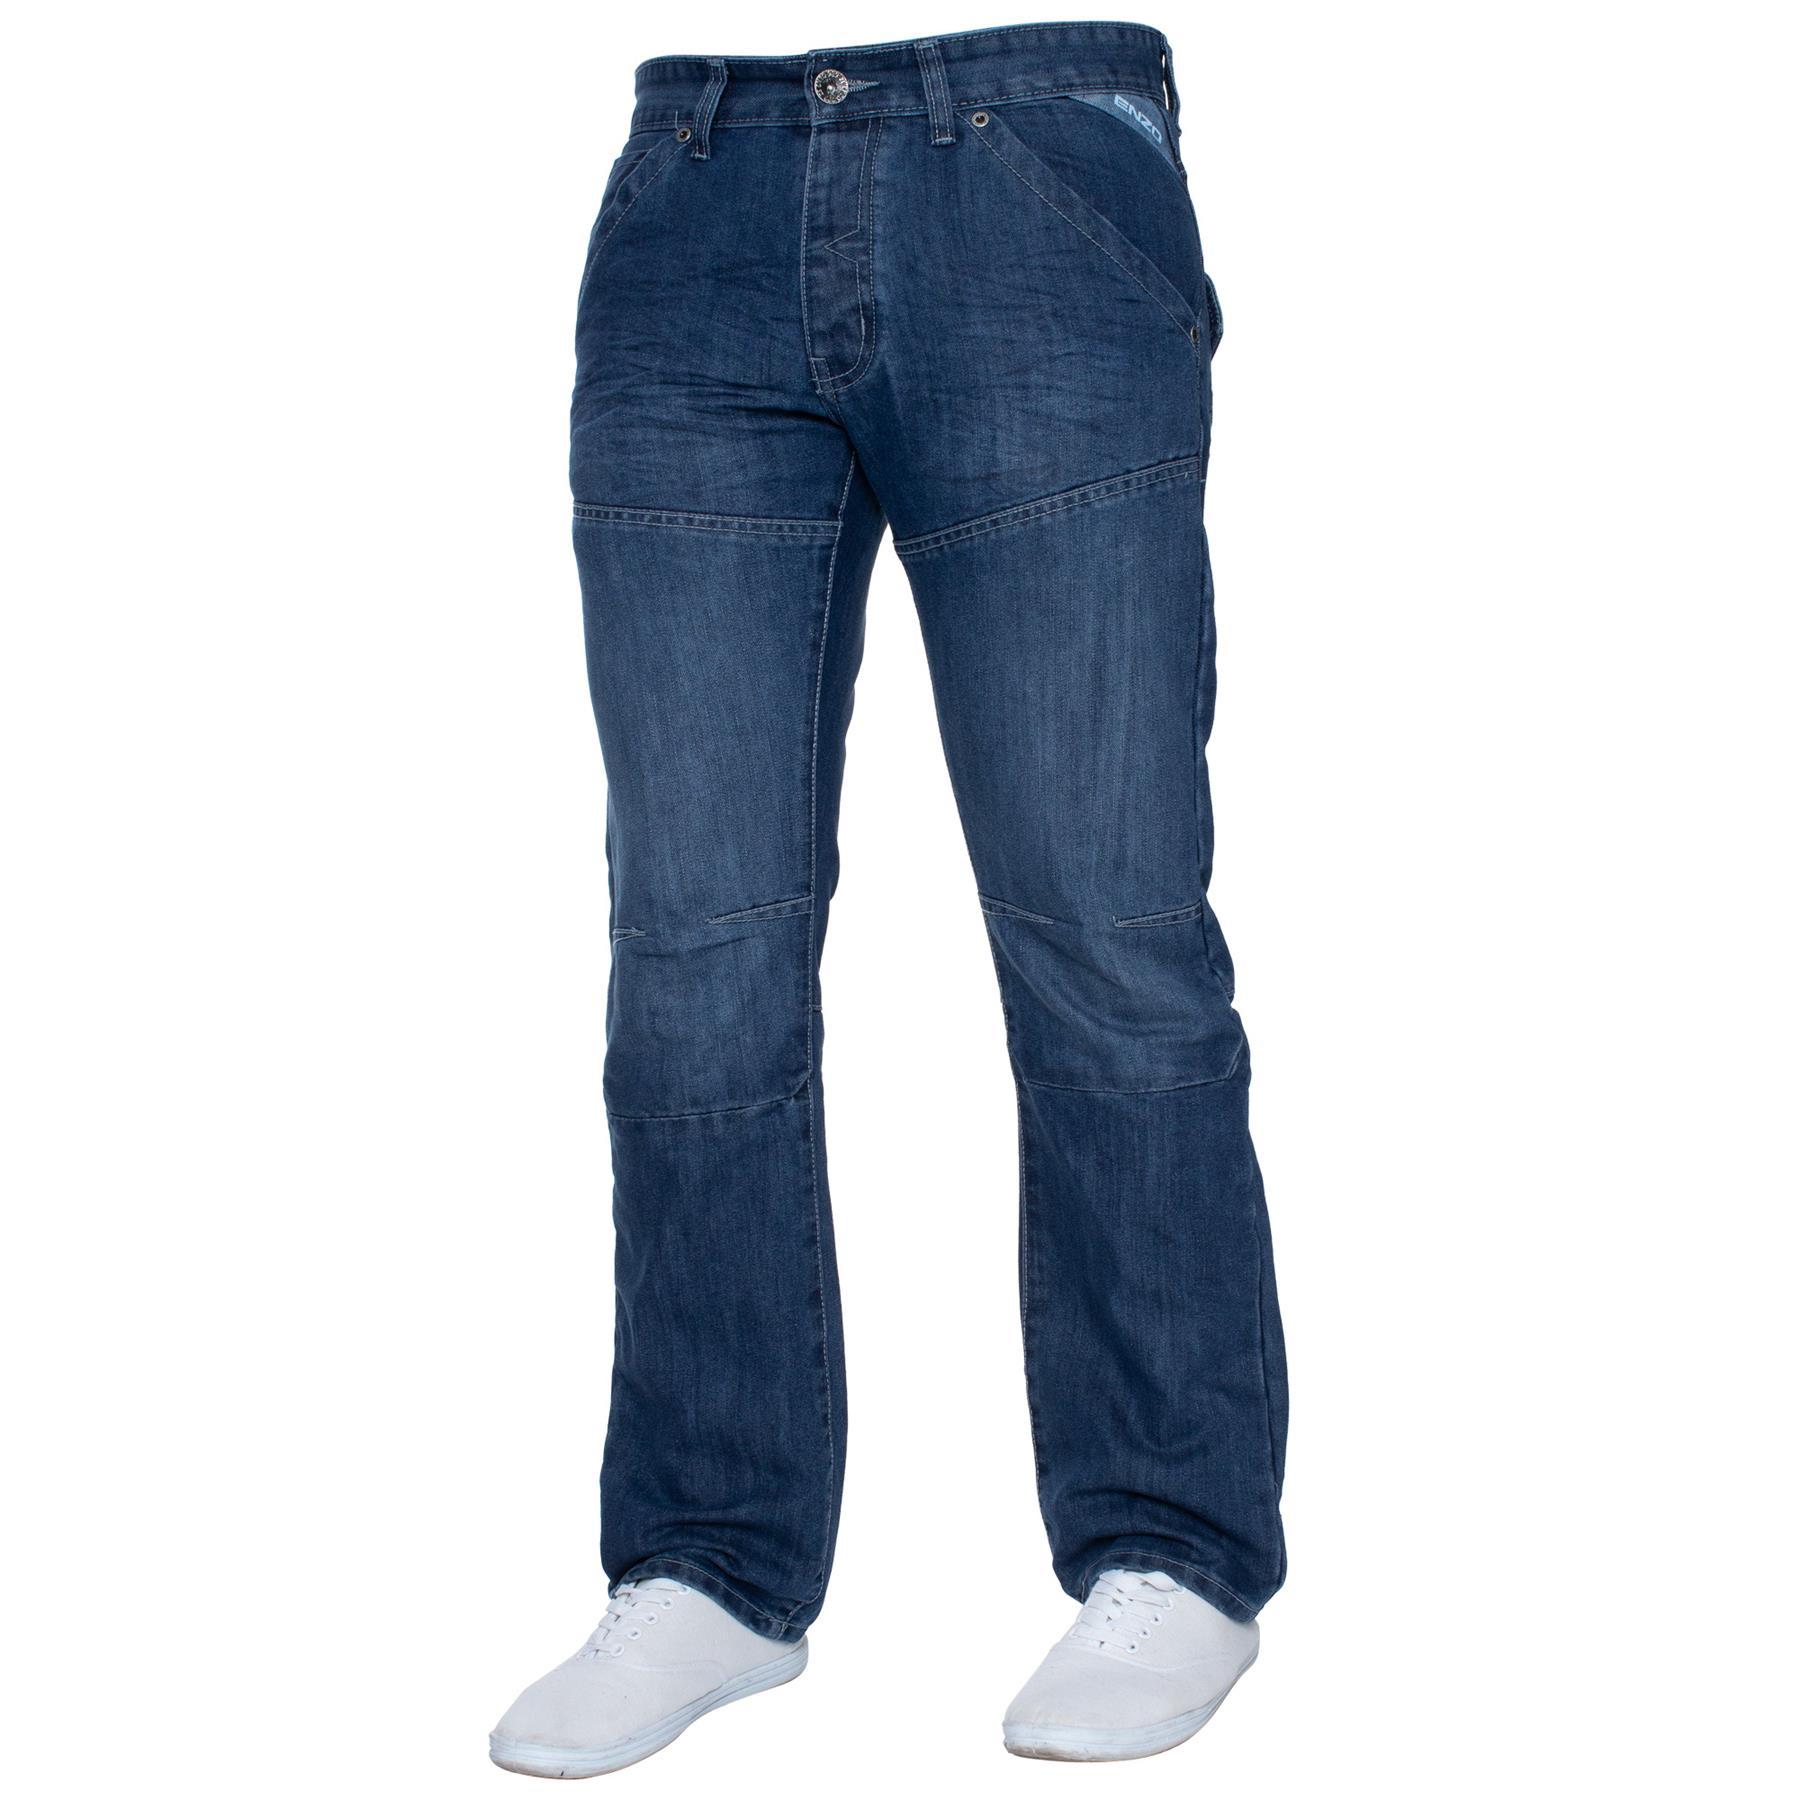 ENZO-Jeans-para-hombre-Big-Alto-Pierna-King-Size-Jeans-Pantalones-Chino-Pantalones-Pantalones-44-034 miniatura 61